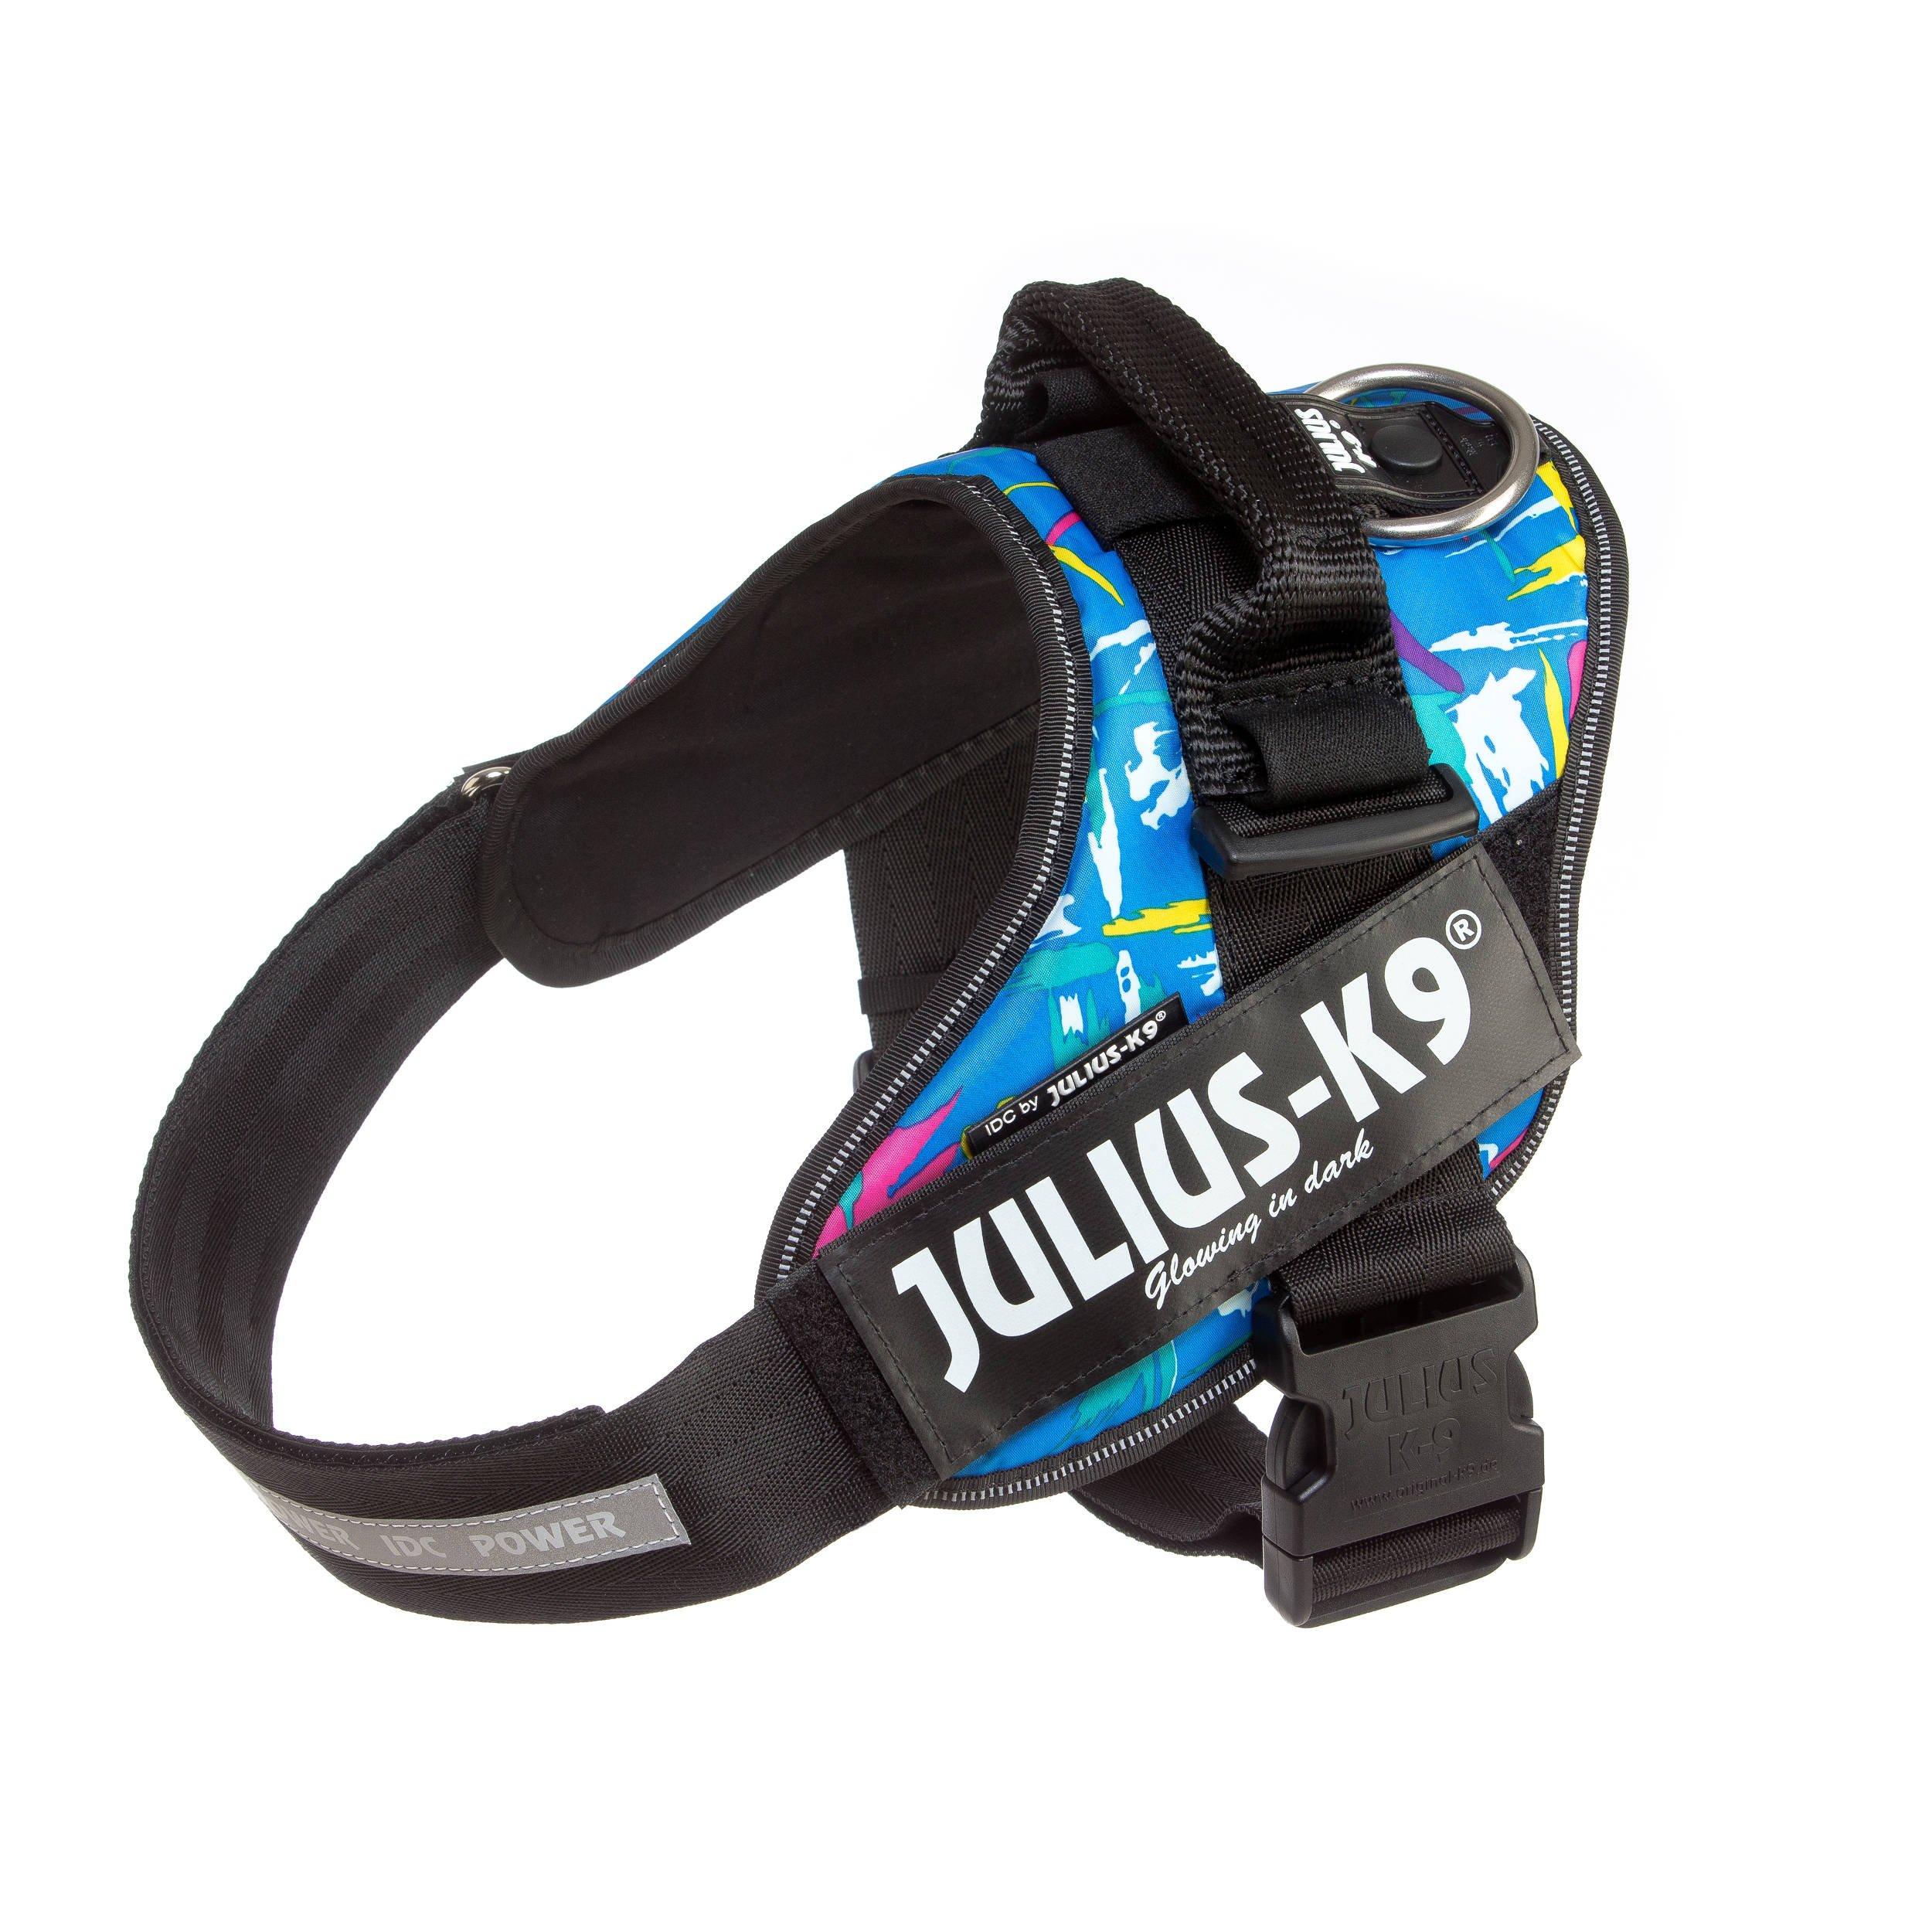 Julius-K9 IDC-Power Harness, Kid Canis, Size: 1/63-85 cm/26-33.5''